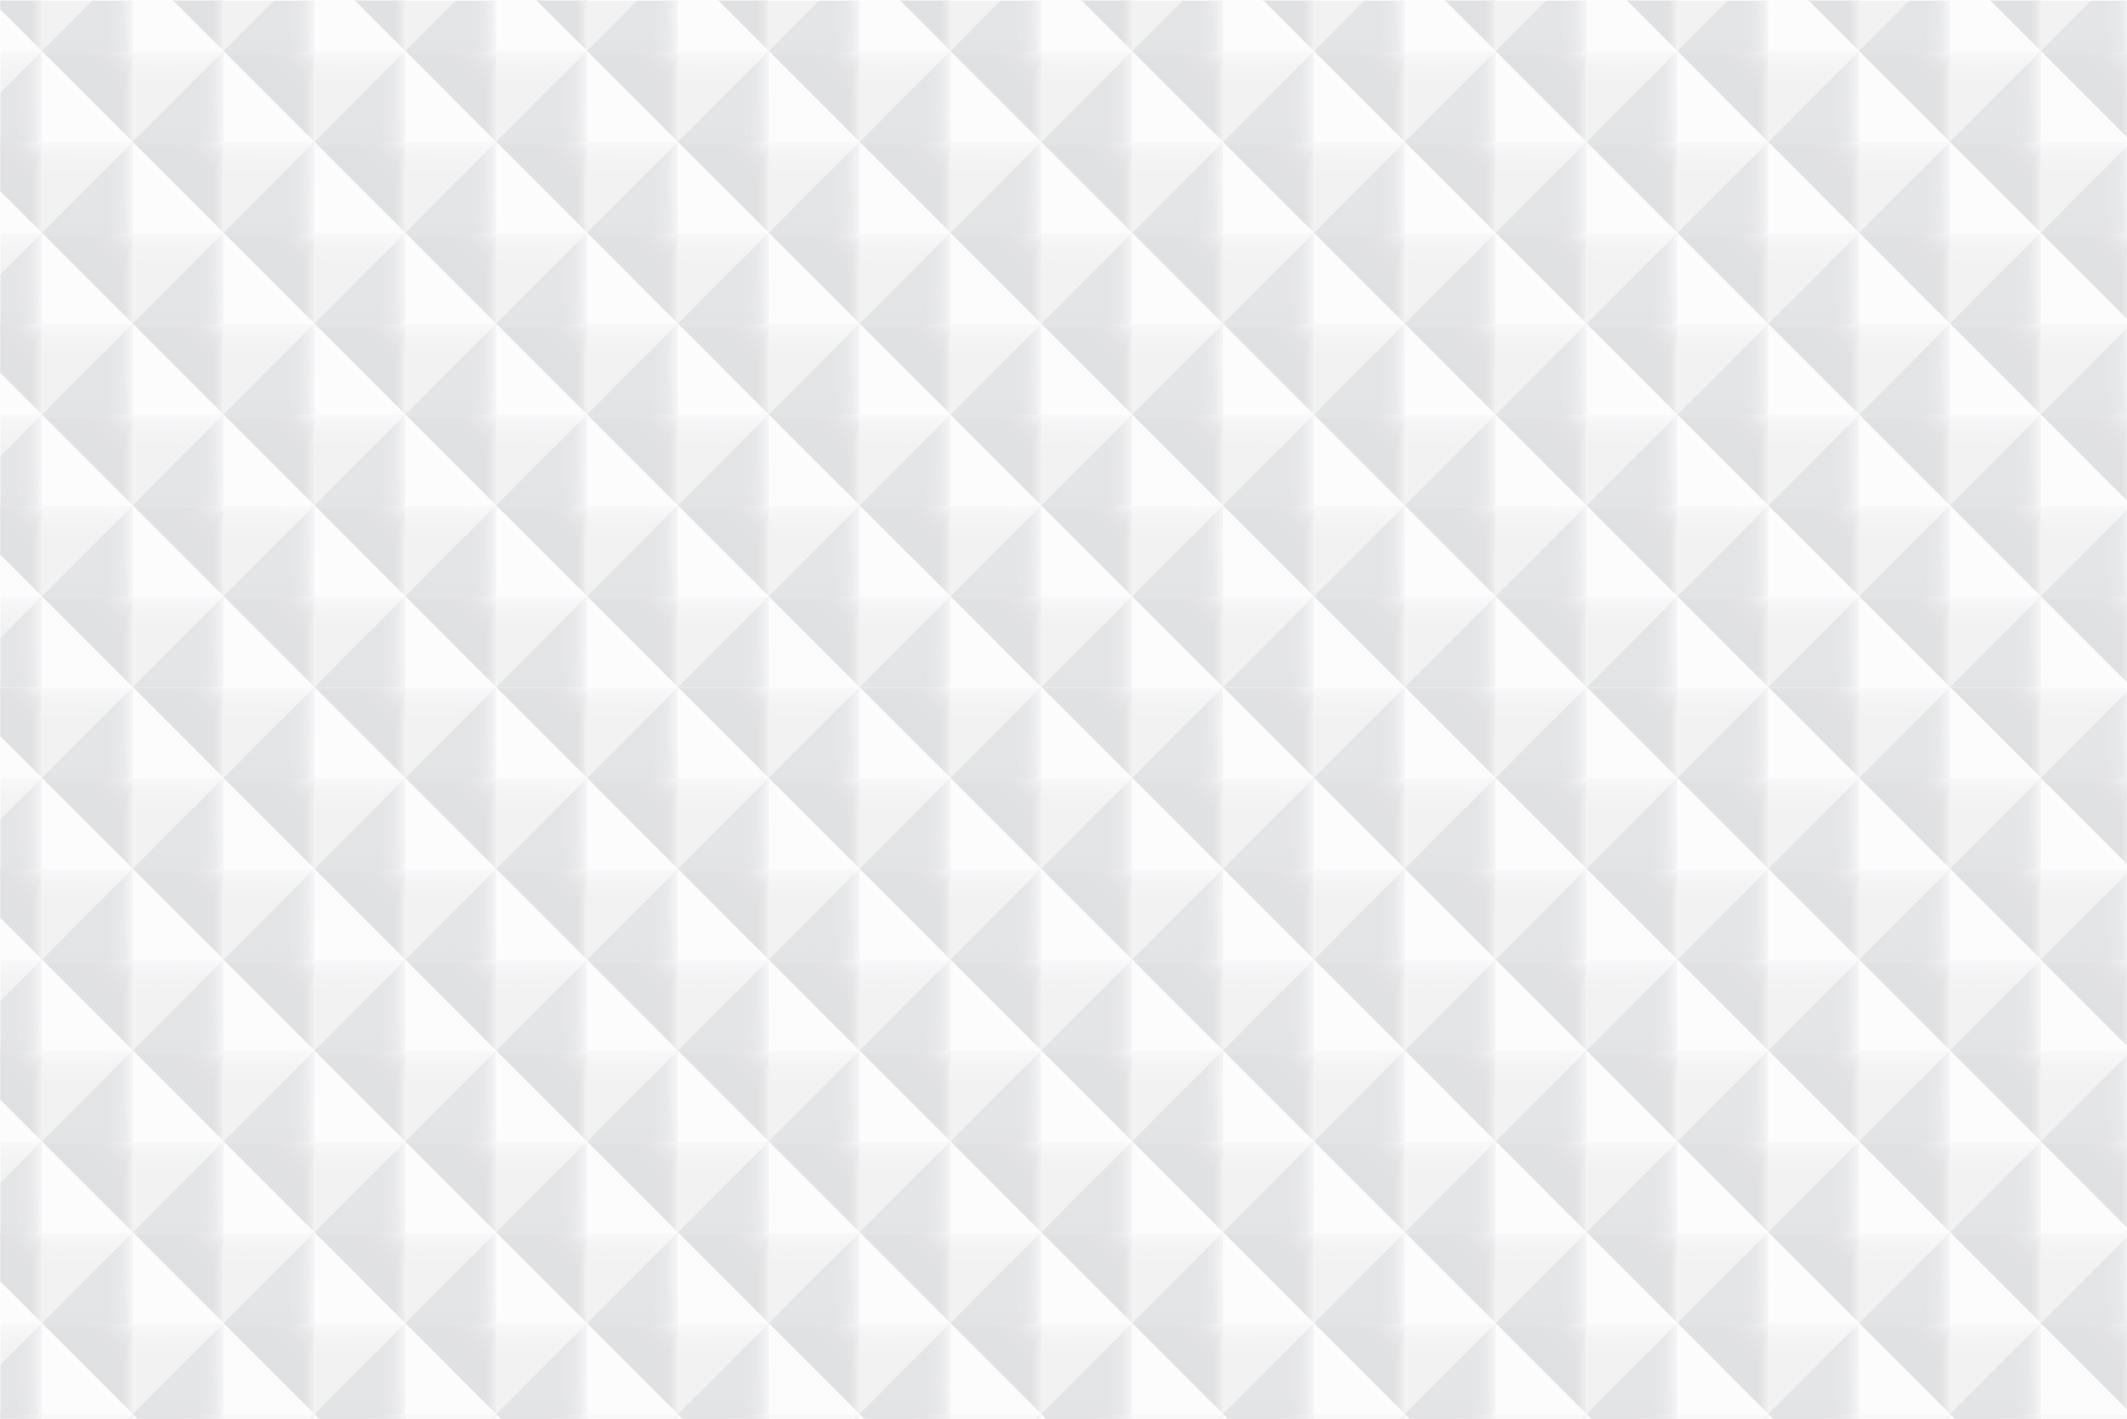 White decorative seamless textures example image 6